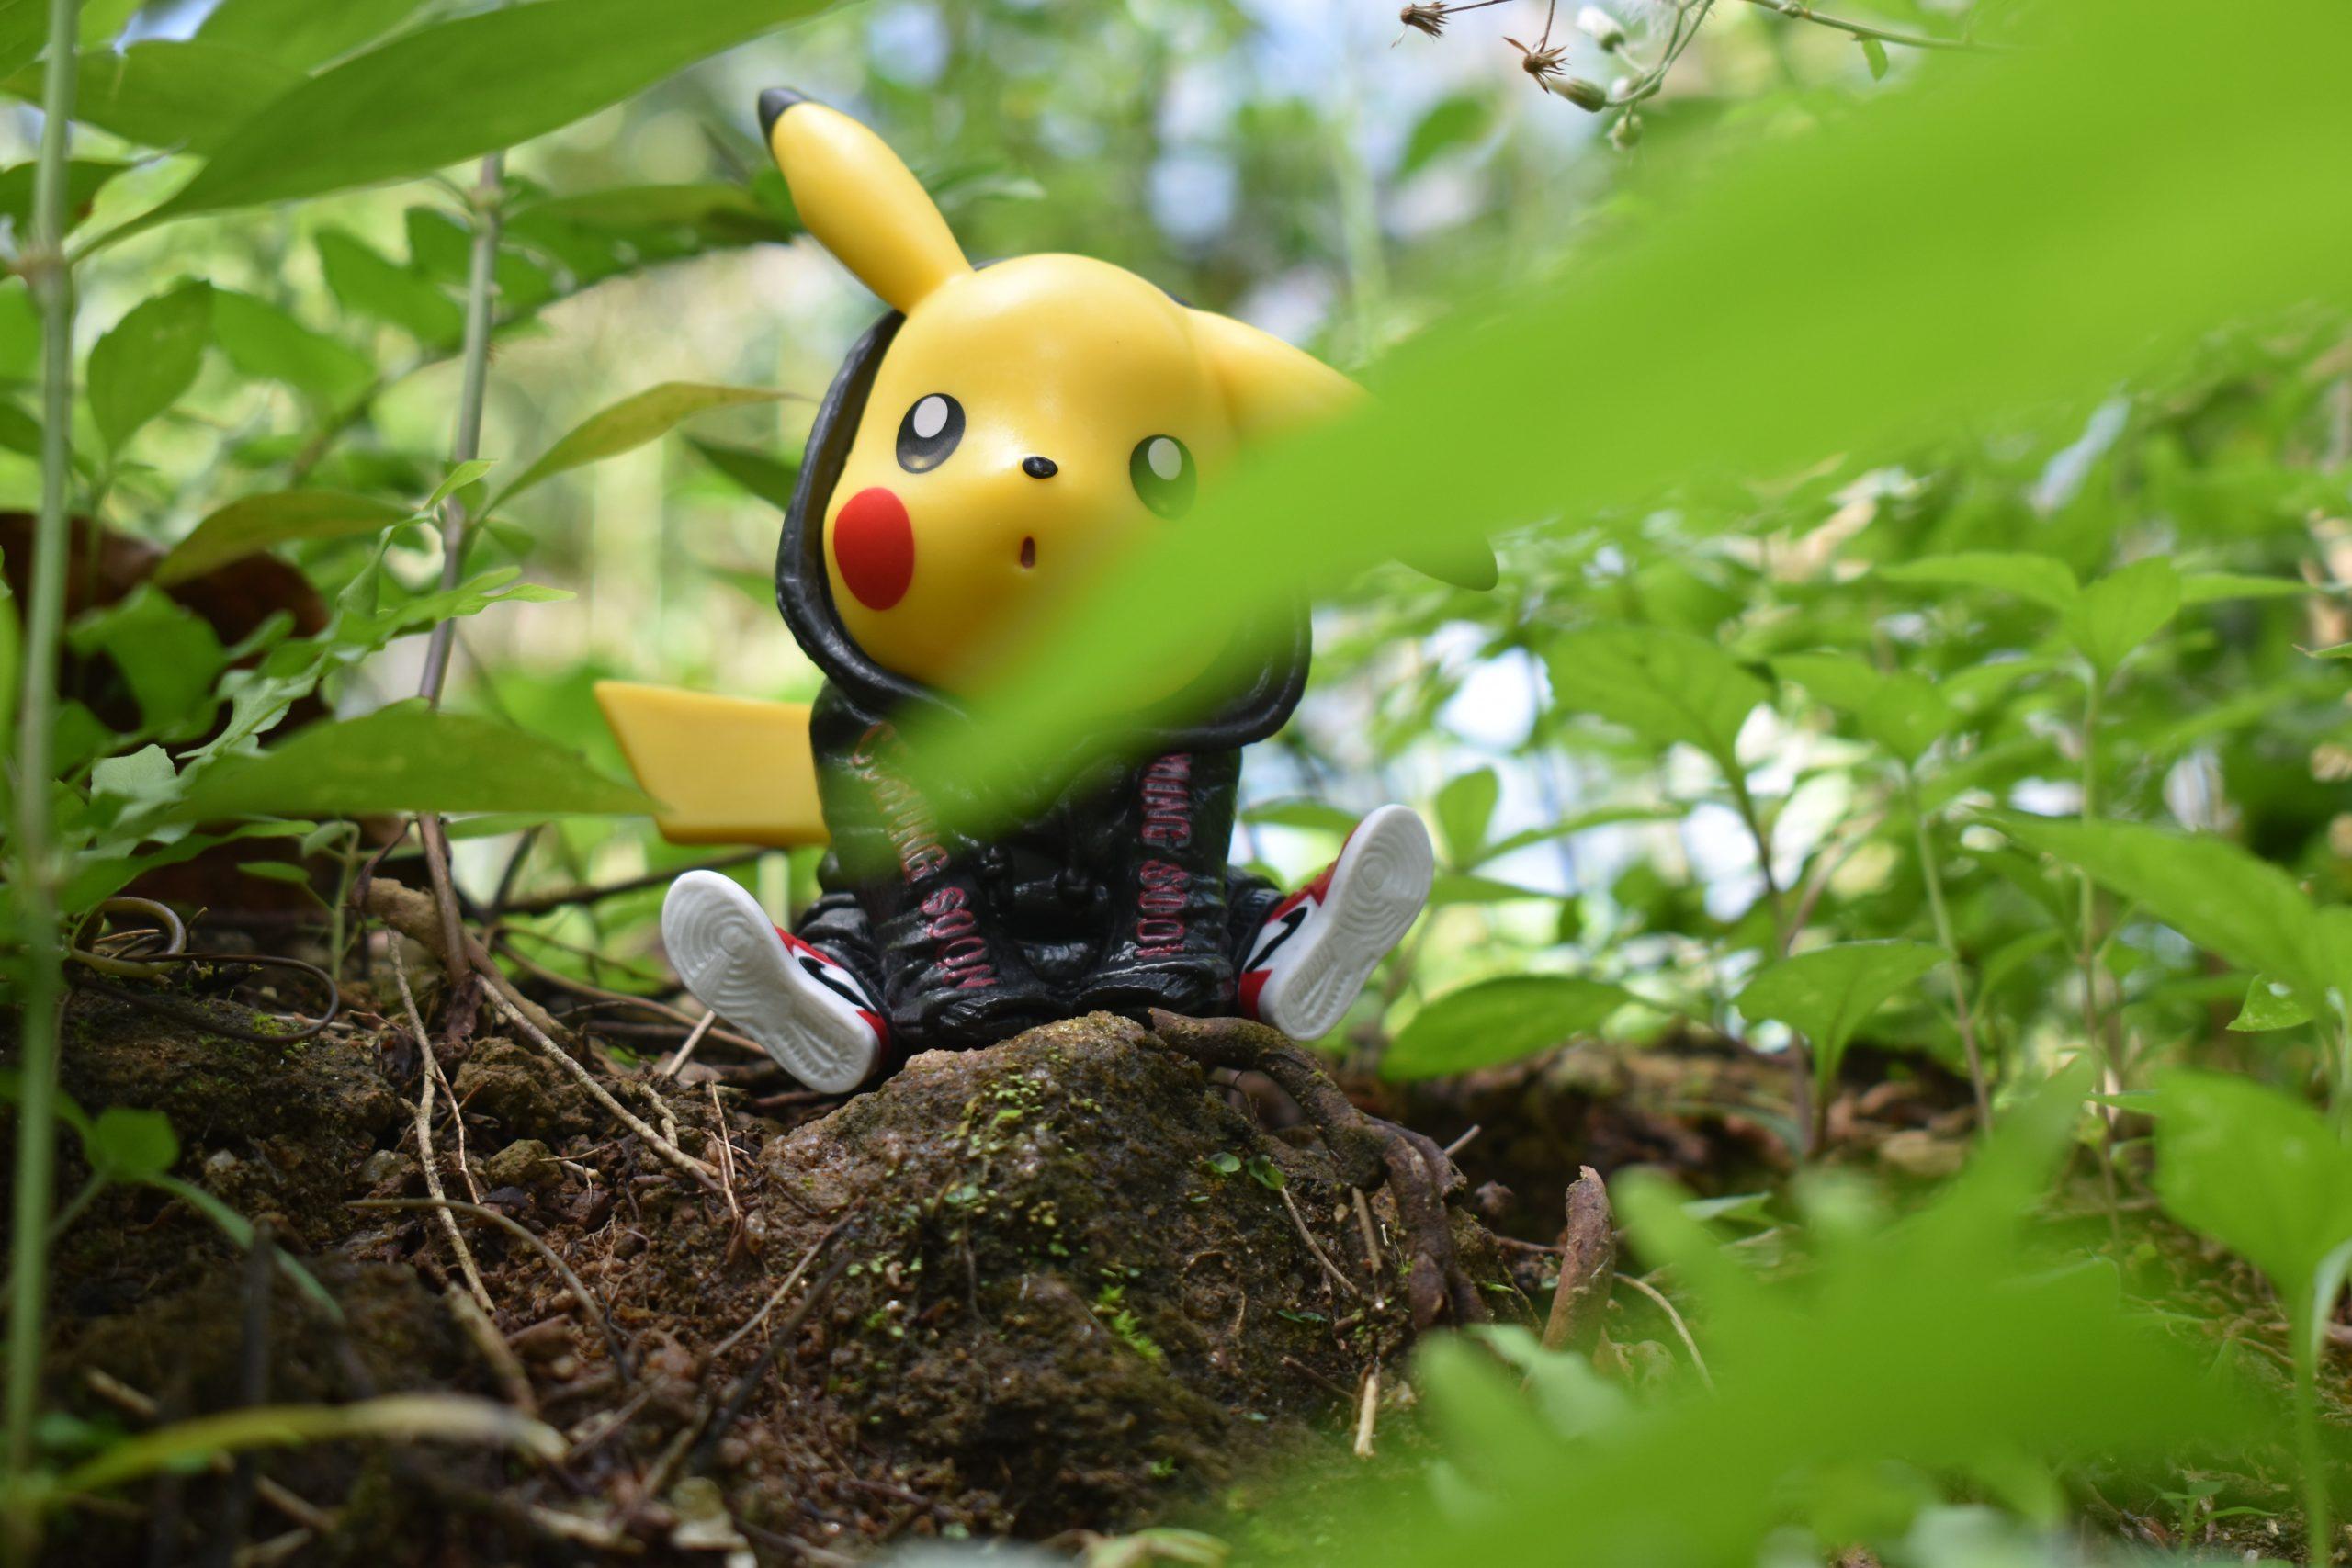 pokemonpros